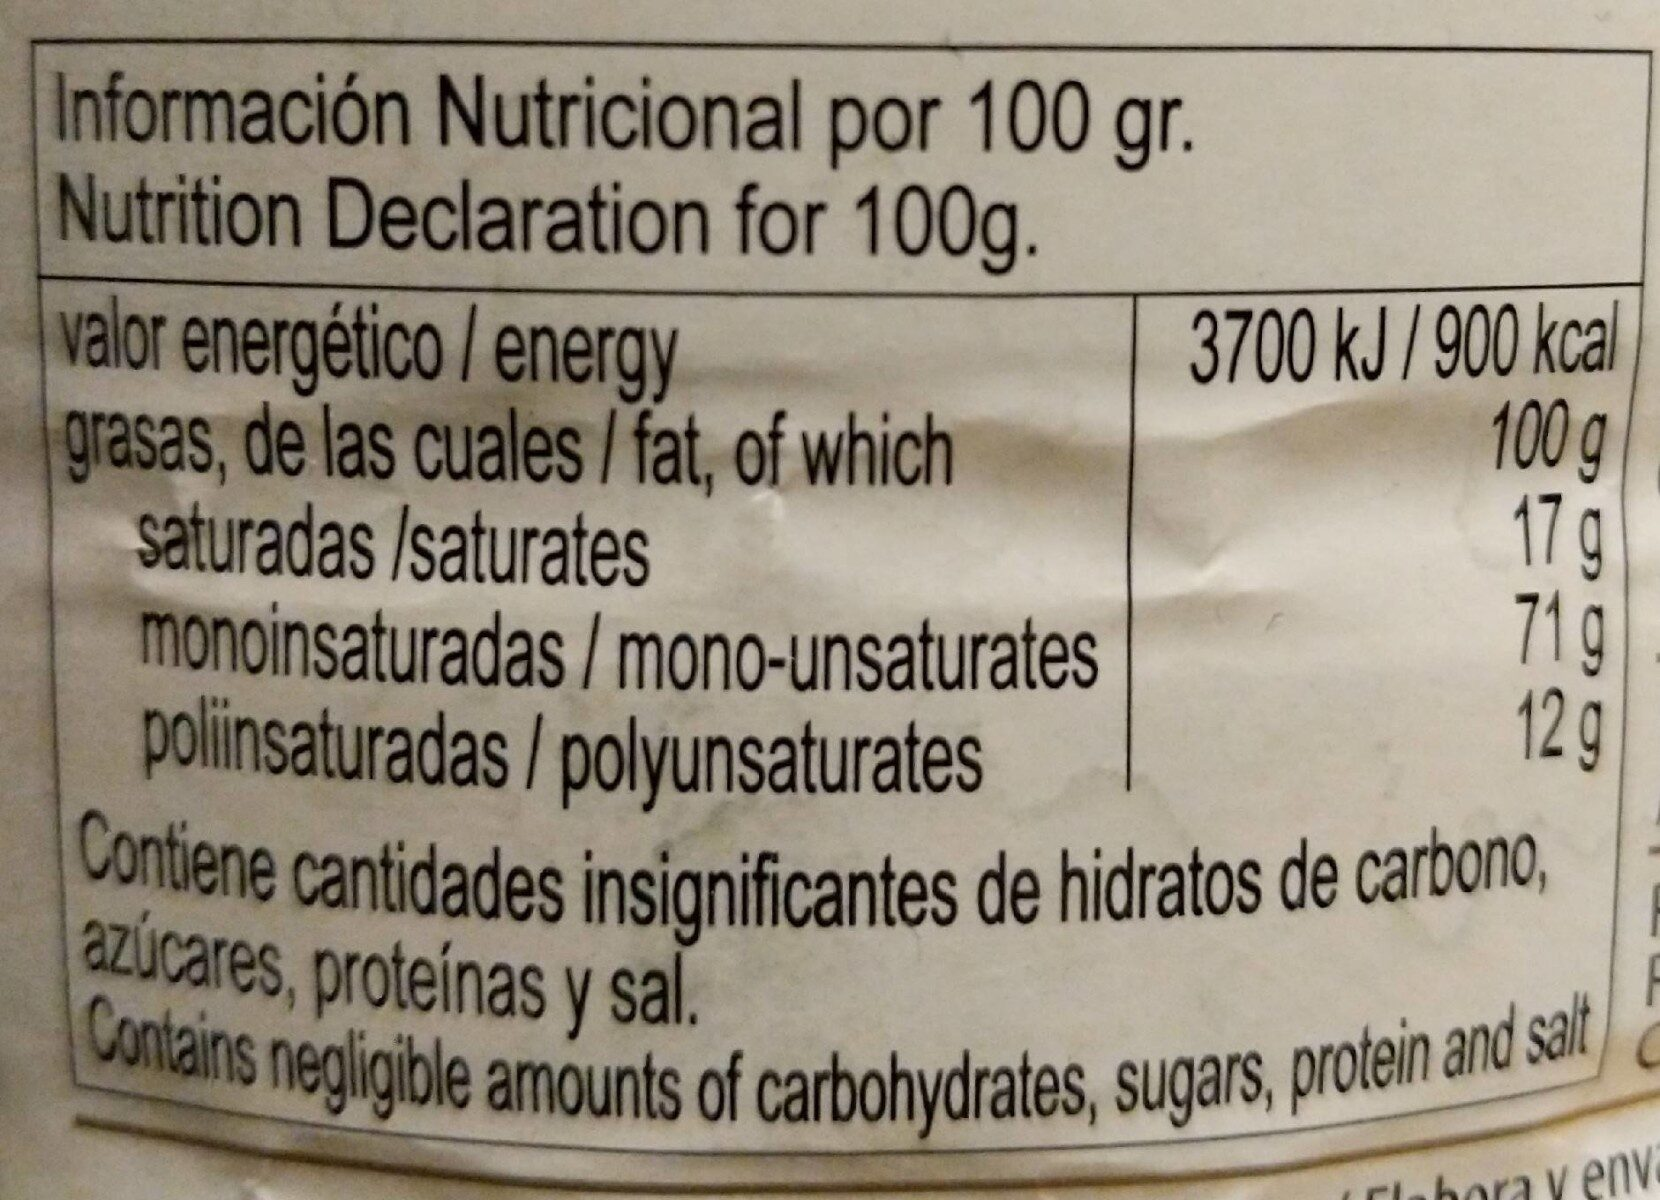 Aceite de oliva virgen extra Arbequina - Informations nutritionnelles - es